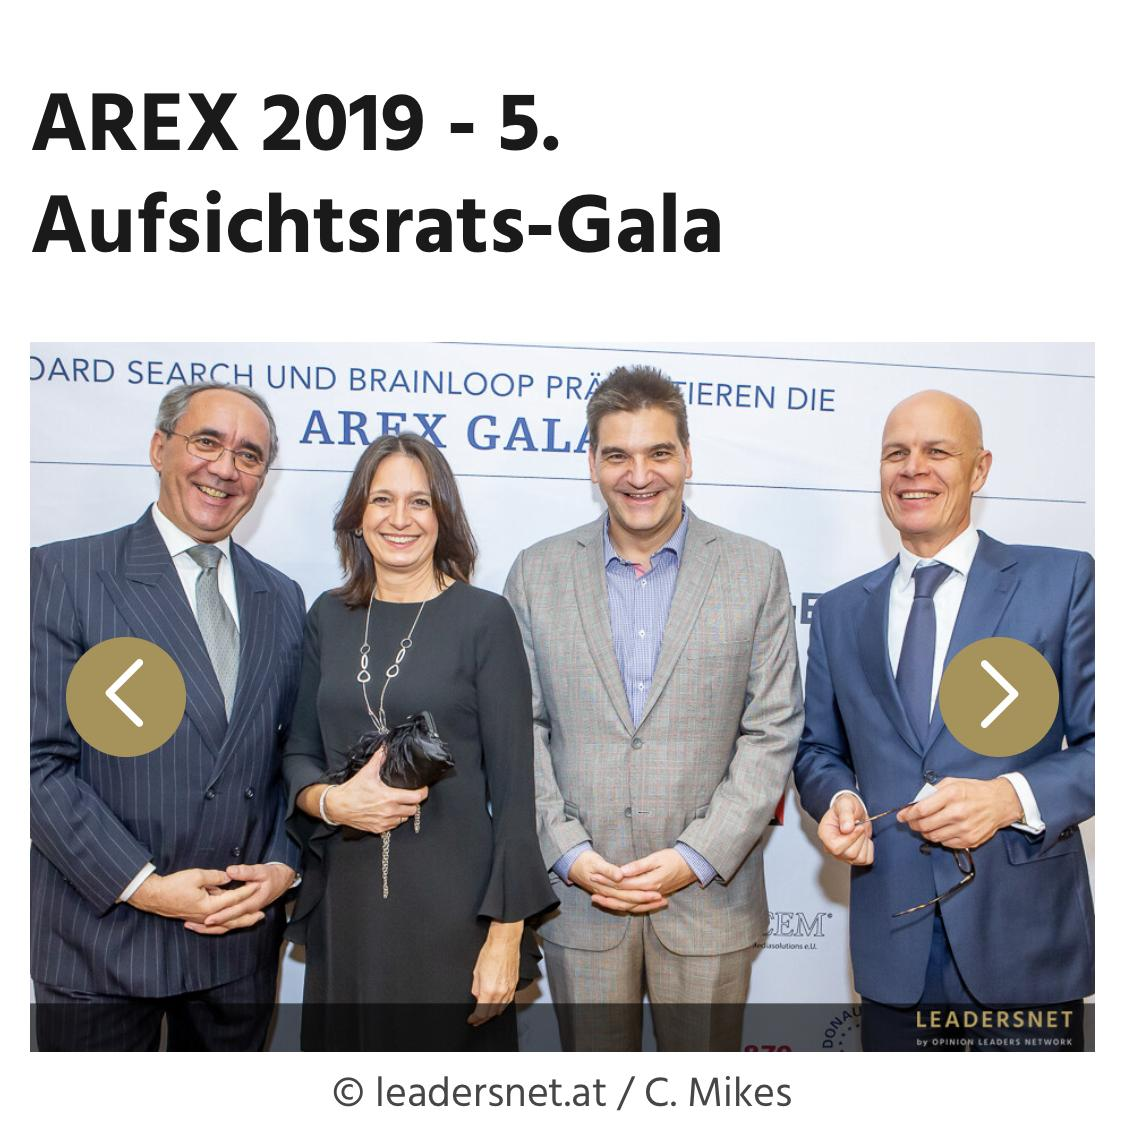 Michael Weilguny AREX Gala 2019 Aufsichtsrat Excellence Gala